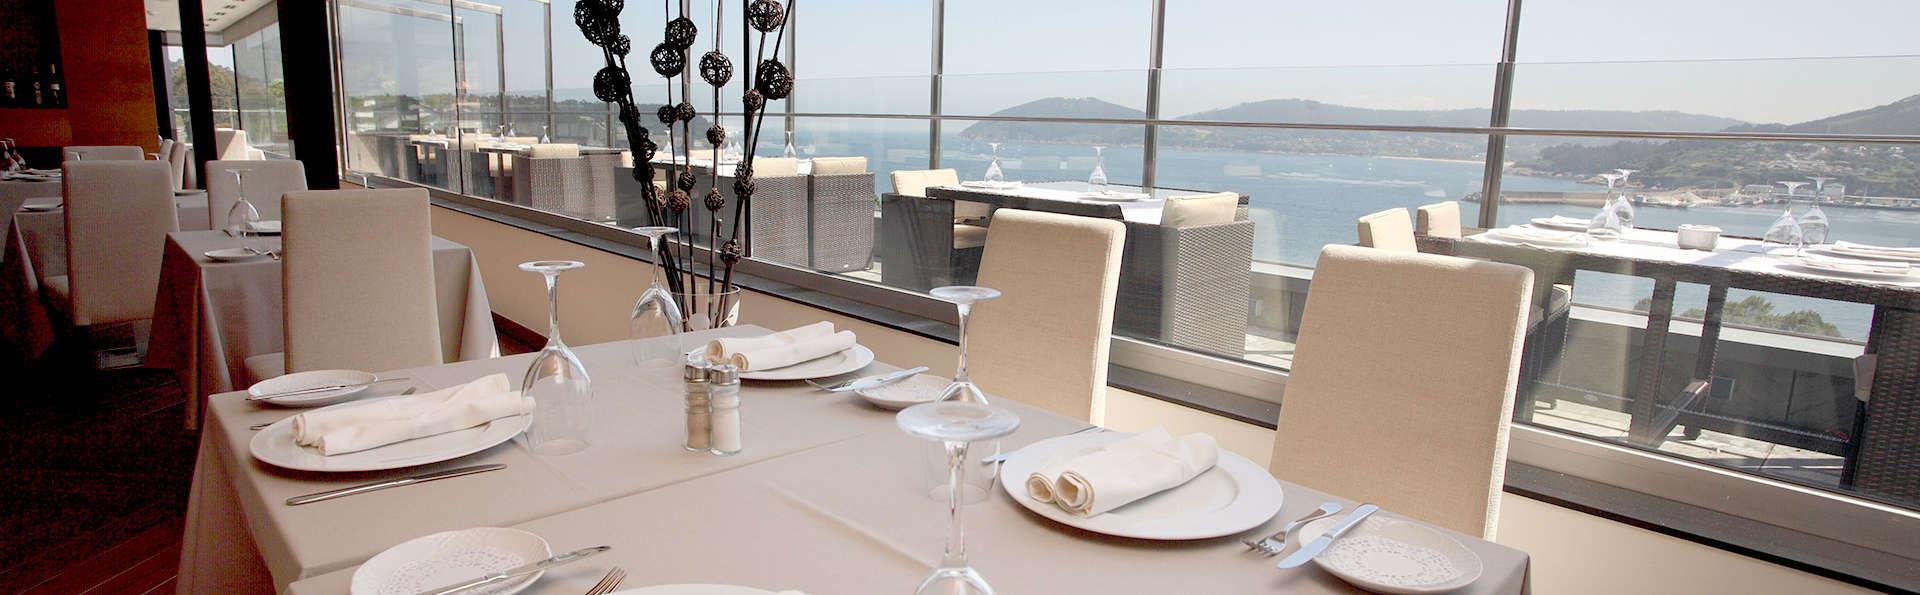 Hotel Thalasso Cantábrico Las Sirenas - Edit_Restaurant4.jpg